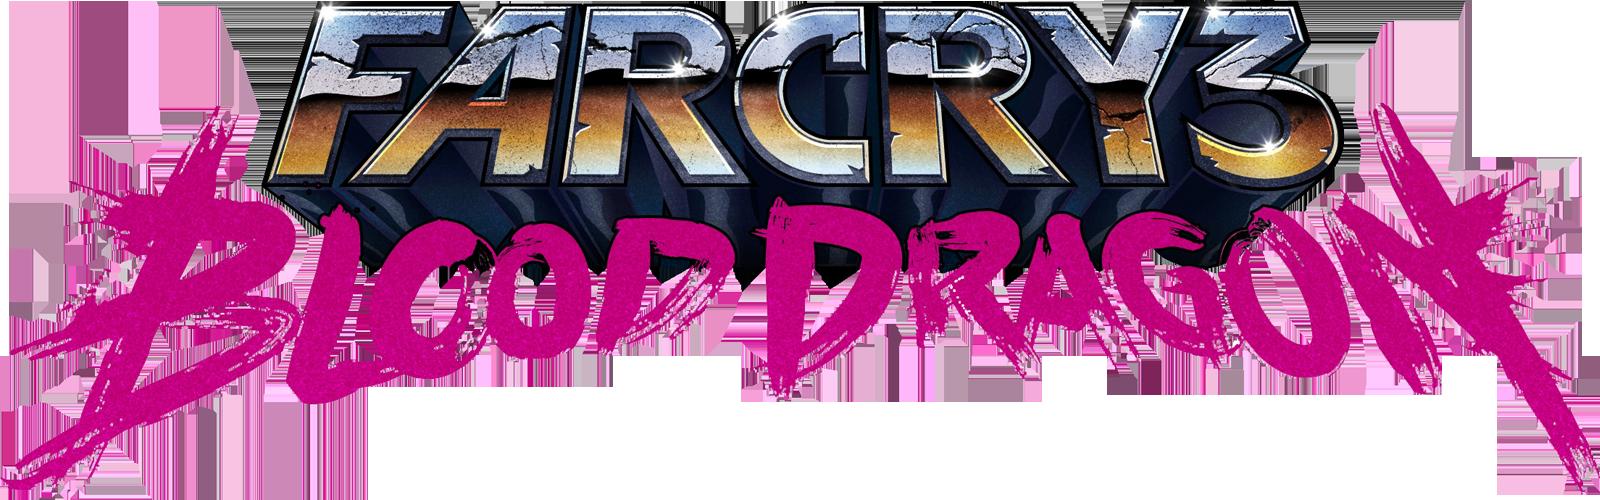 Far Cry 3: Blood Dragon | Logopedia | Fandom powered by Wikia